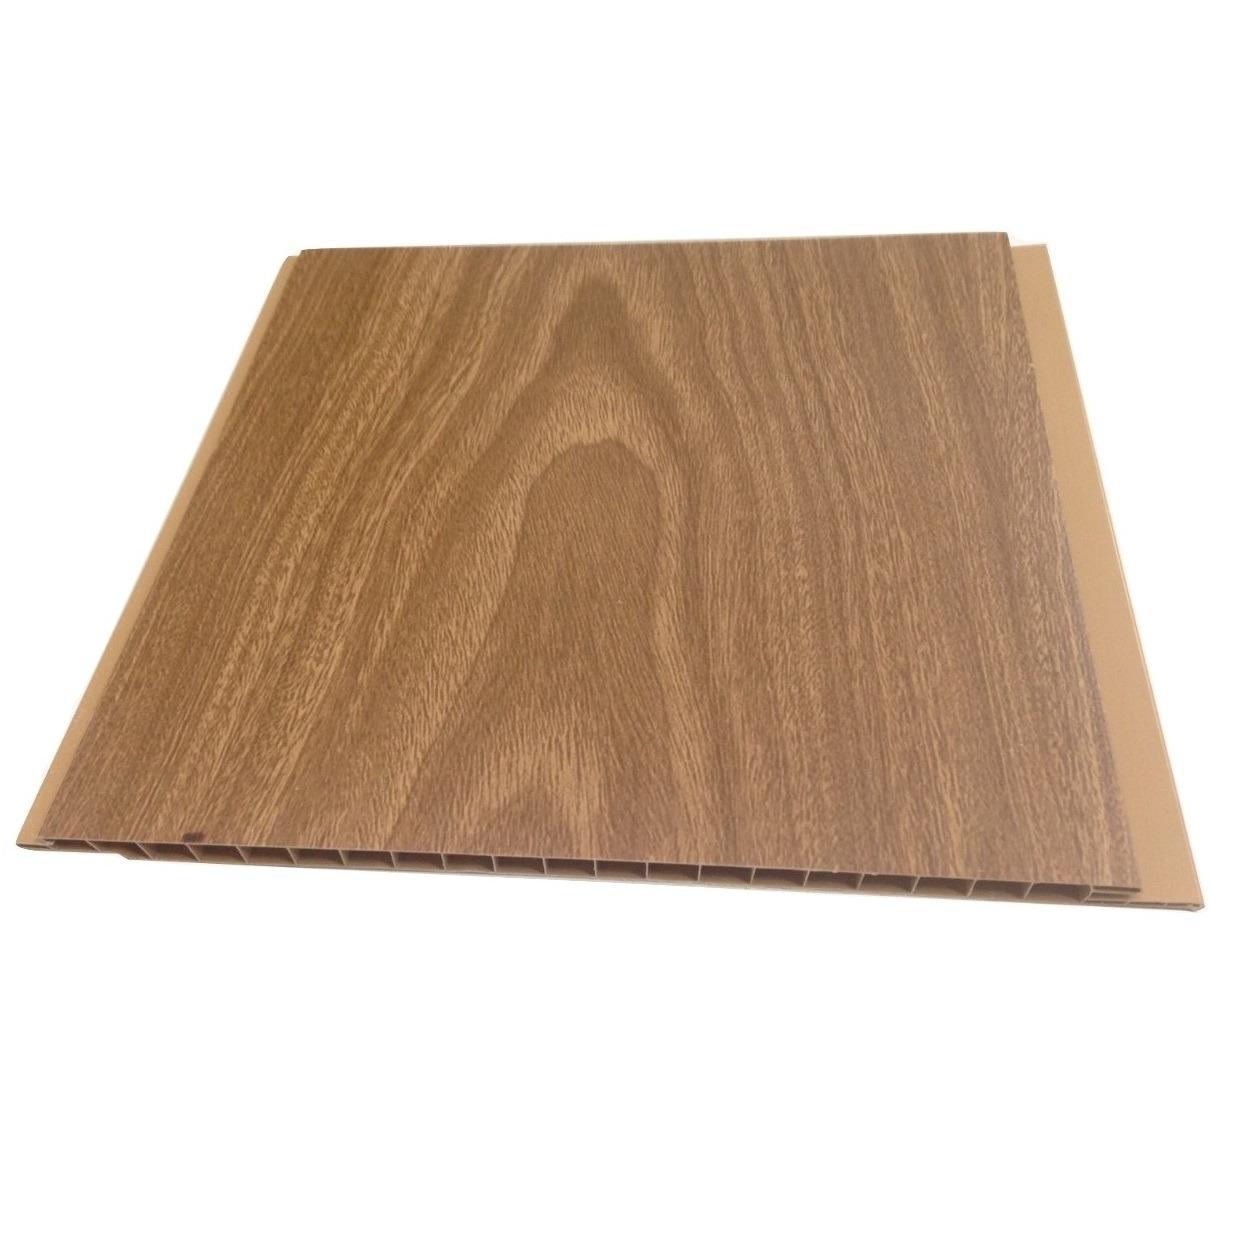 Forro PVC Madeirado 20 x 600 cm - 22060038 - Perfilplast